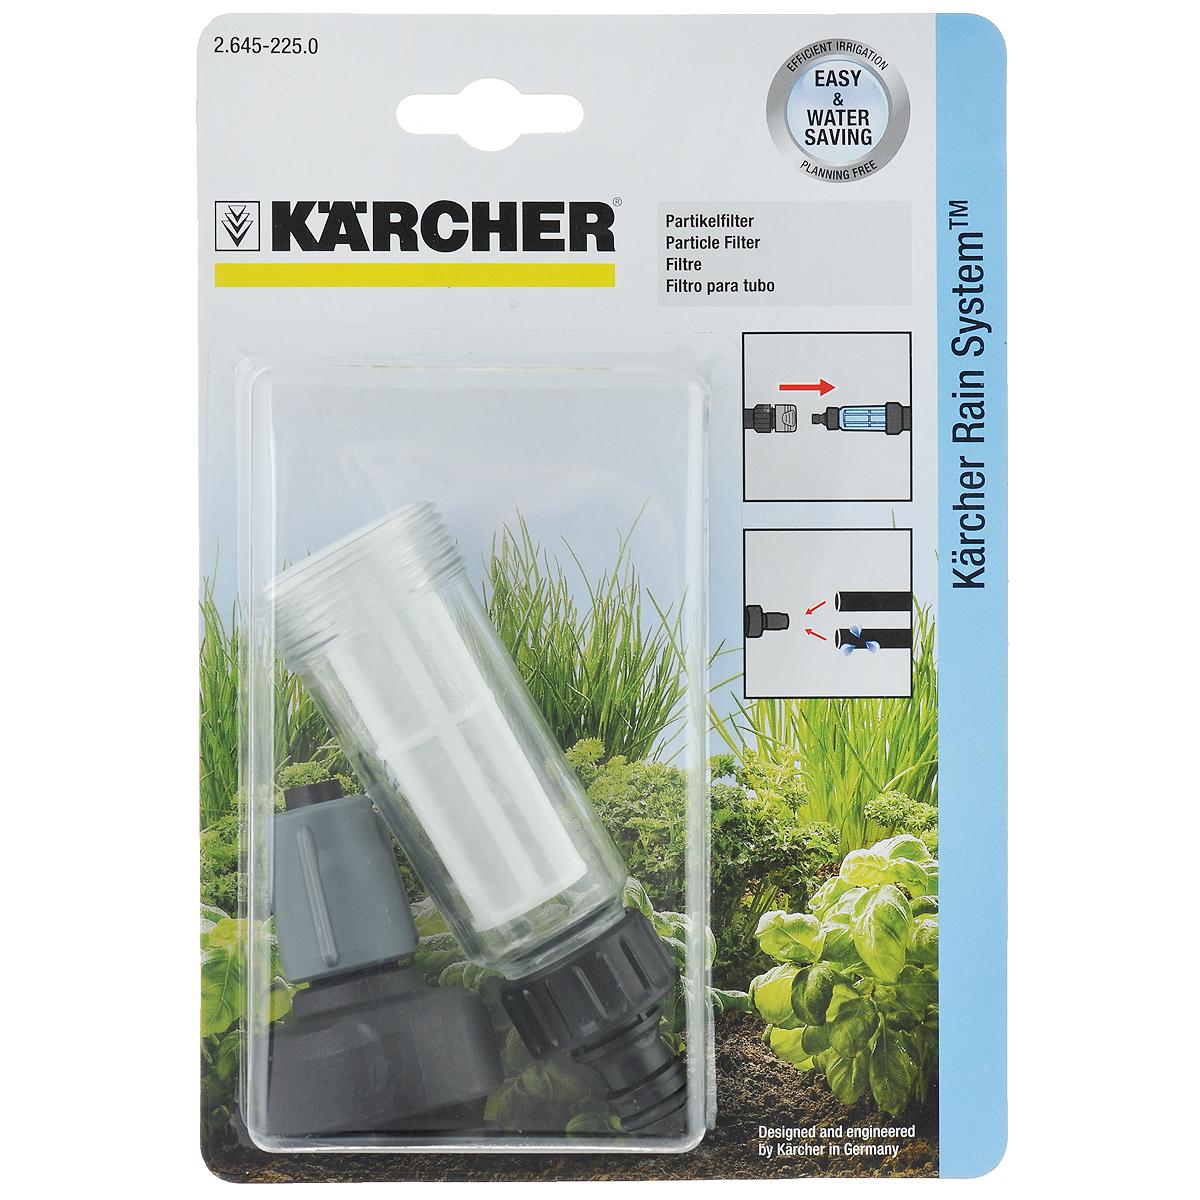 ������ ������� �������� Karcher 2.645-225.0 - Karcher2.645-225.0������ ������ ������������ ��� ������ ������� �������� Karcher Rain System �� ������ �����. ������� ����������� ������������� � ������� ������� �������� Karcher.